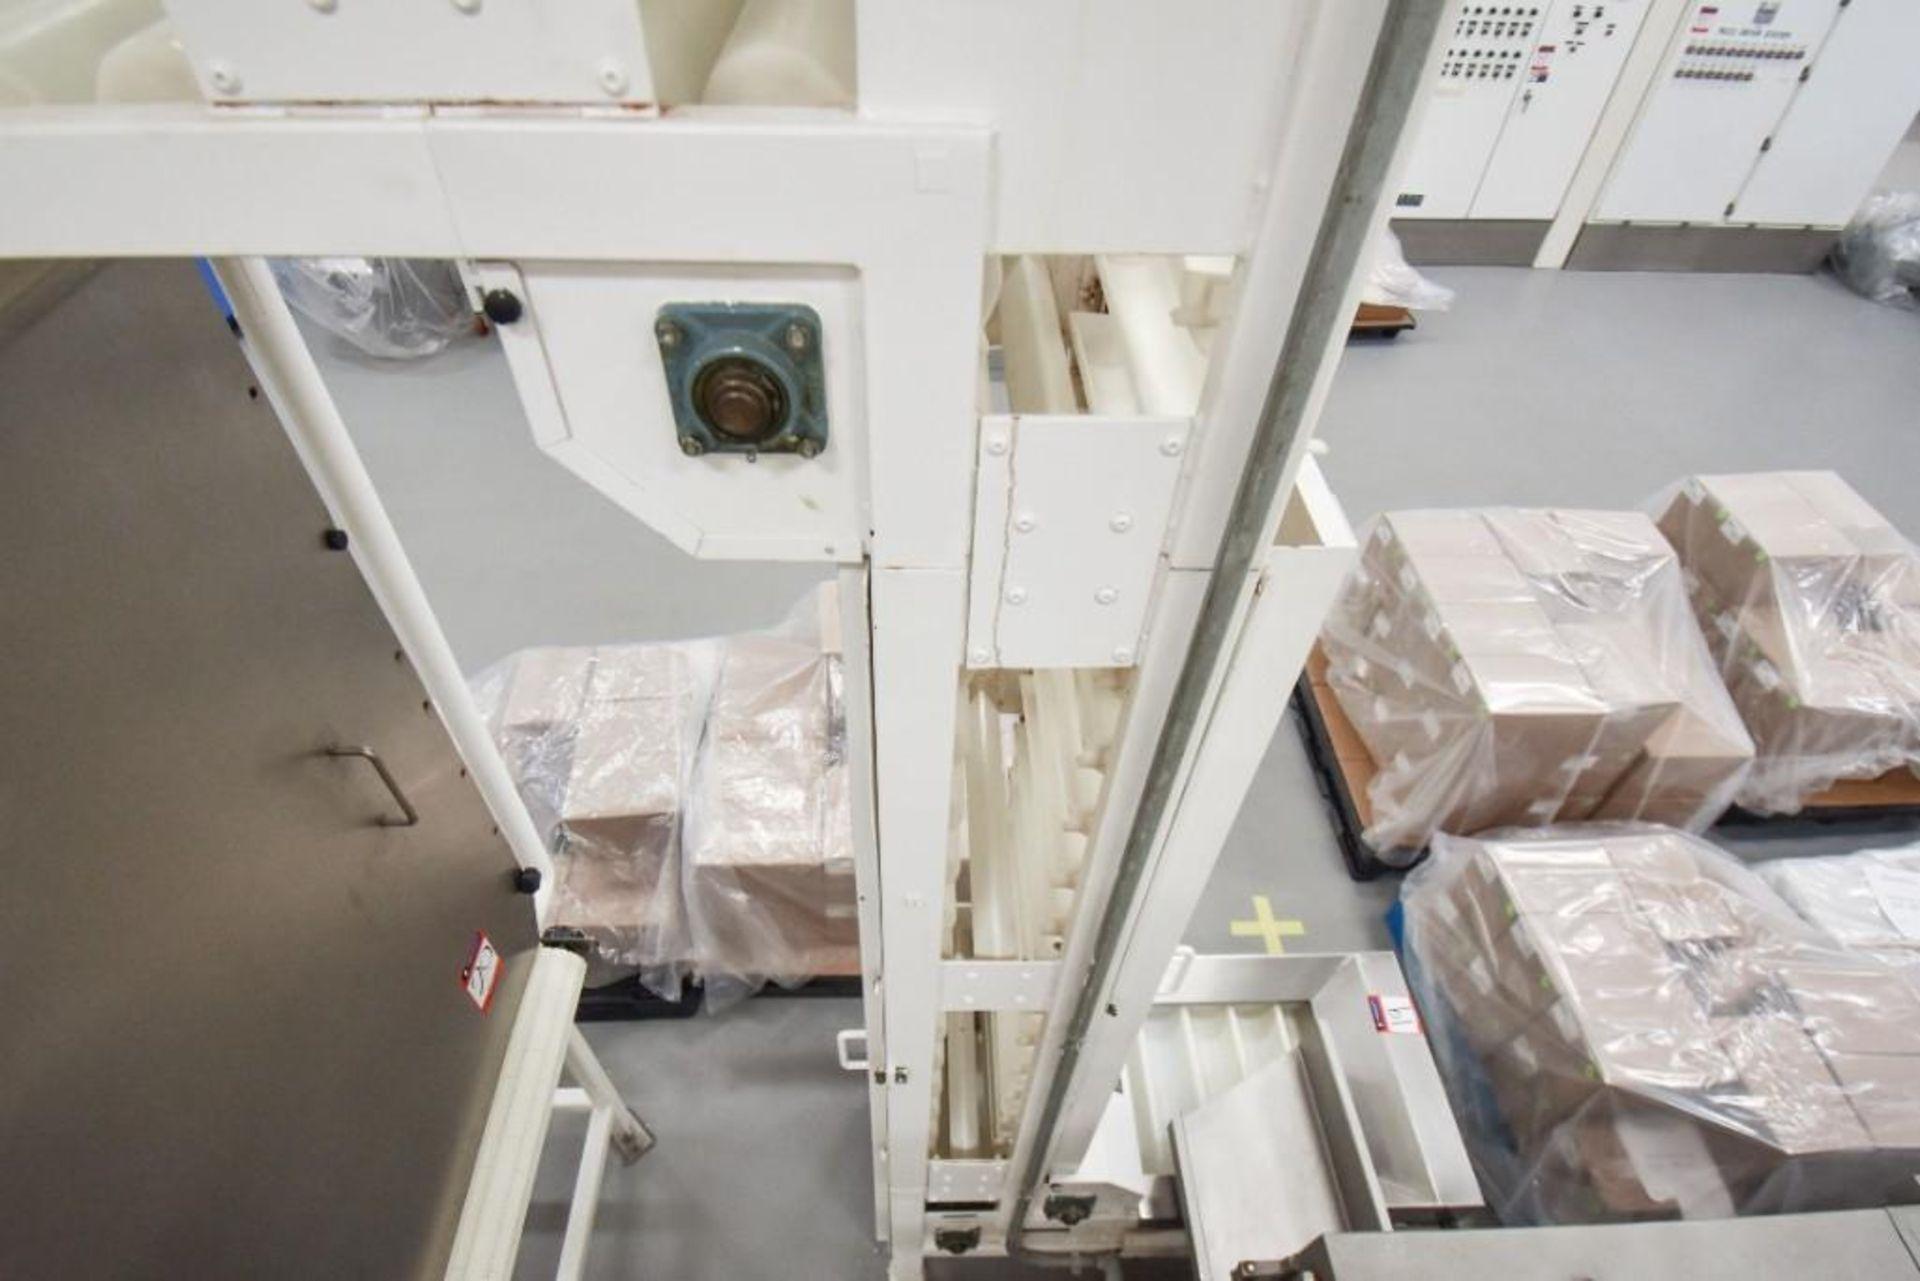 RBM Accumulation Hopper Conveyor and Vibratory Deck AC-1-4X4-6 - Image 10 of 11